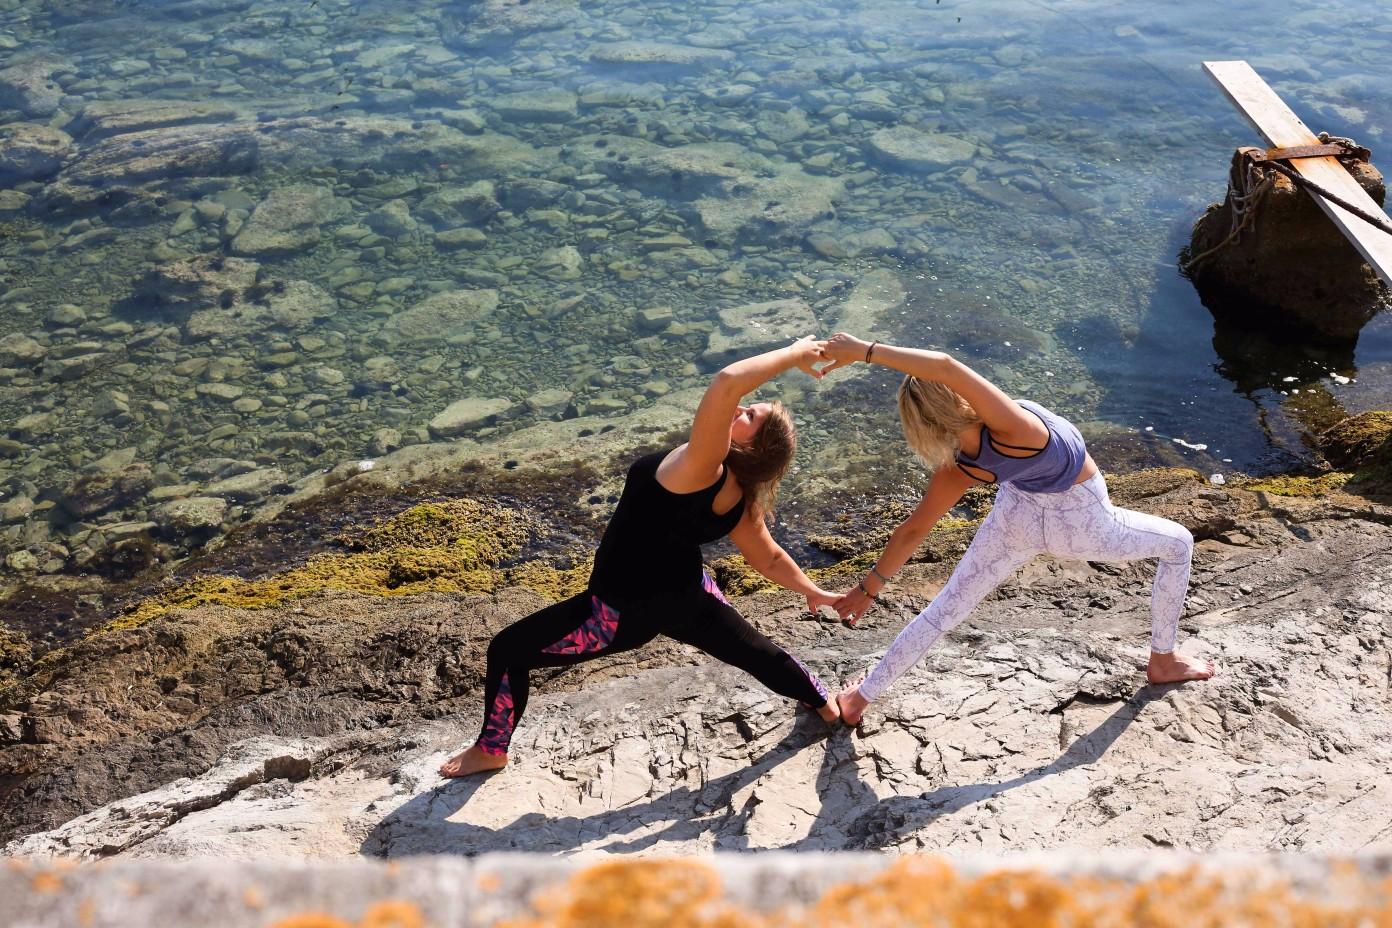 summersalt-yoga-balance-vis-croatia41.jpg